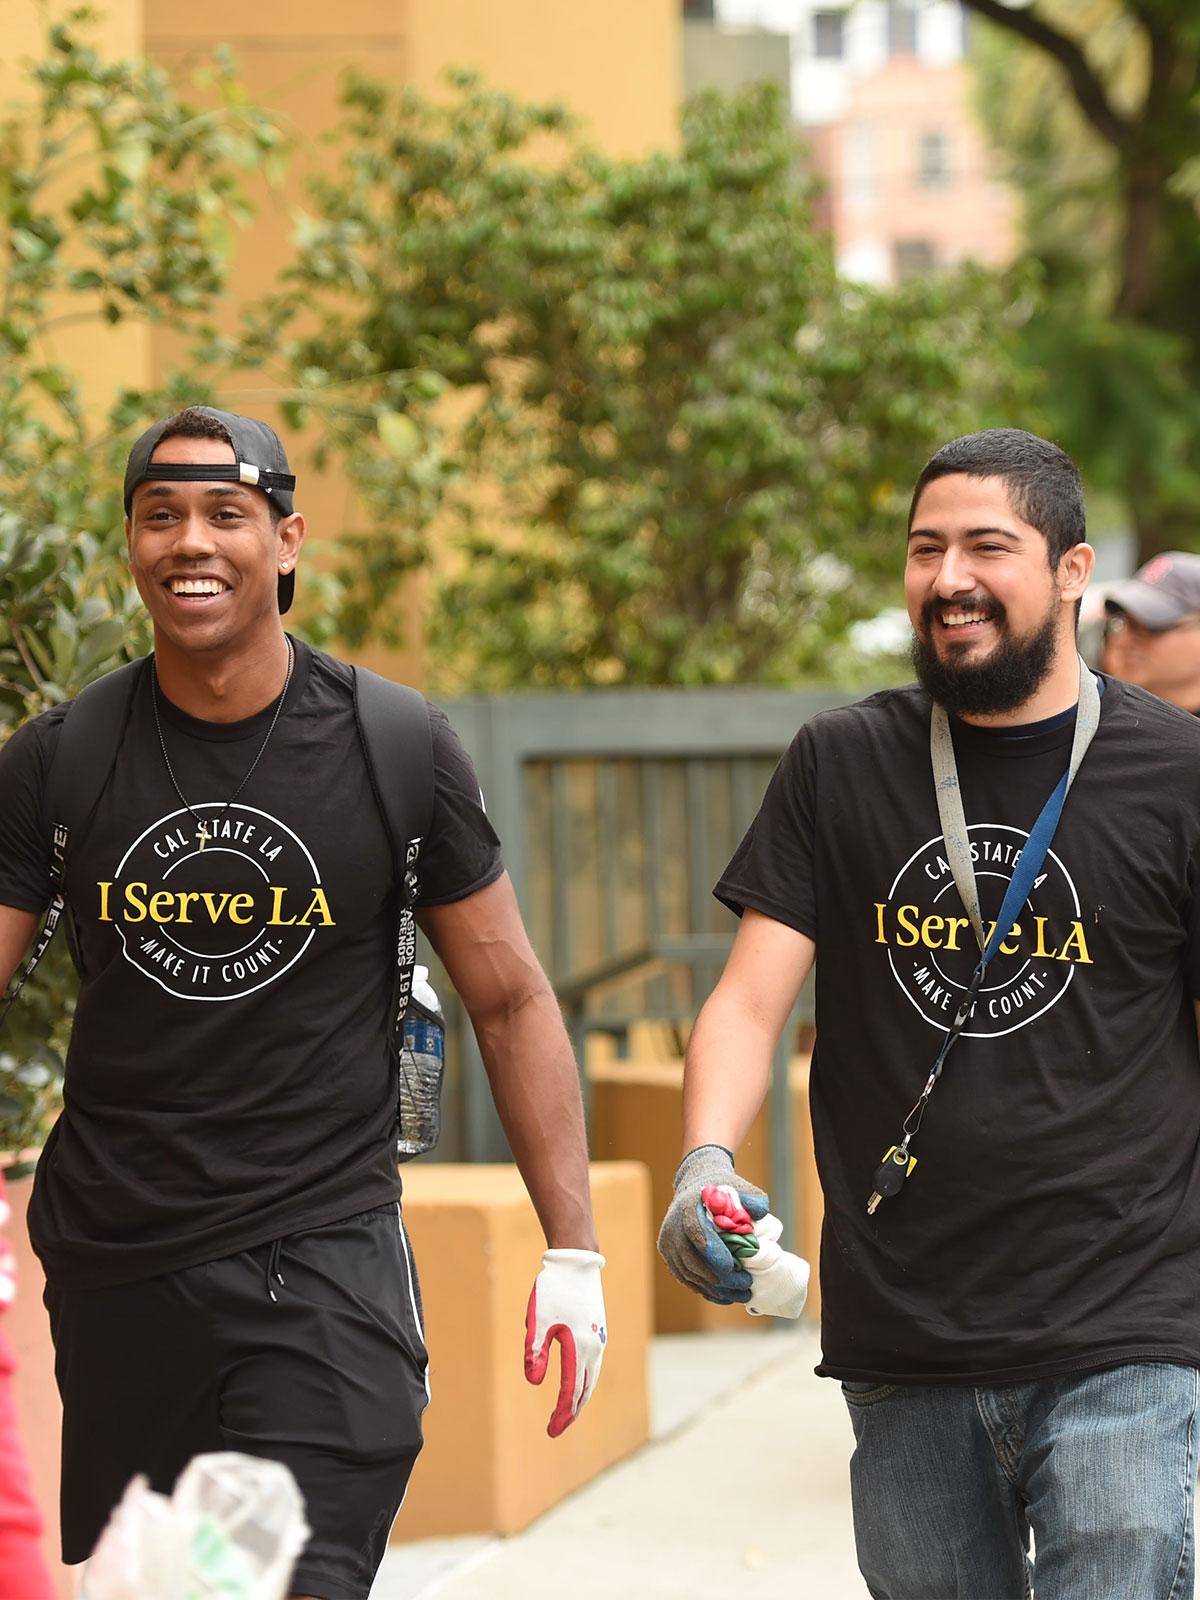 Students volunteering in I Serve LA T-Shirts